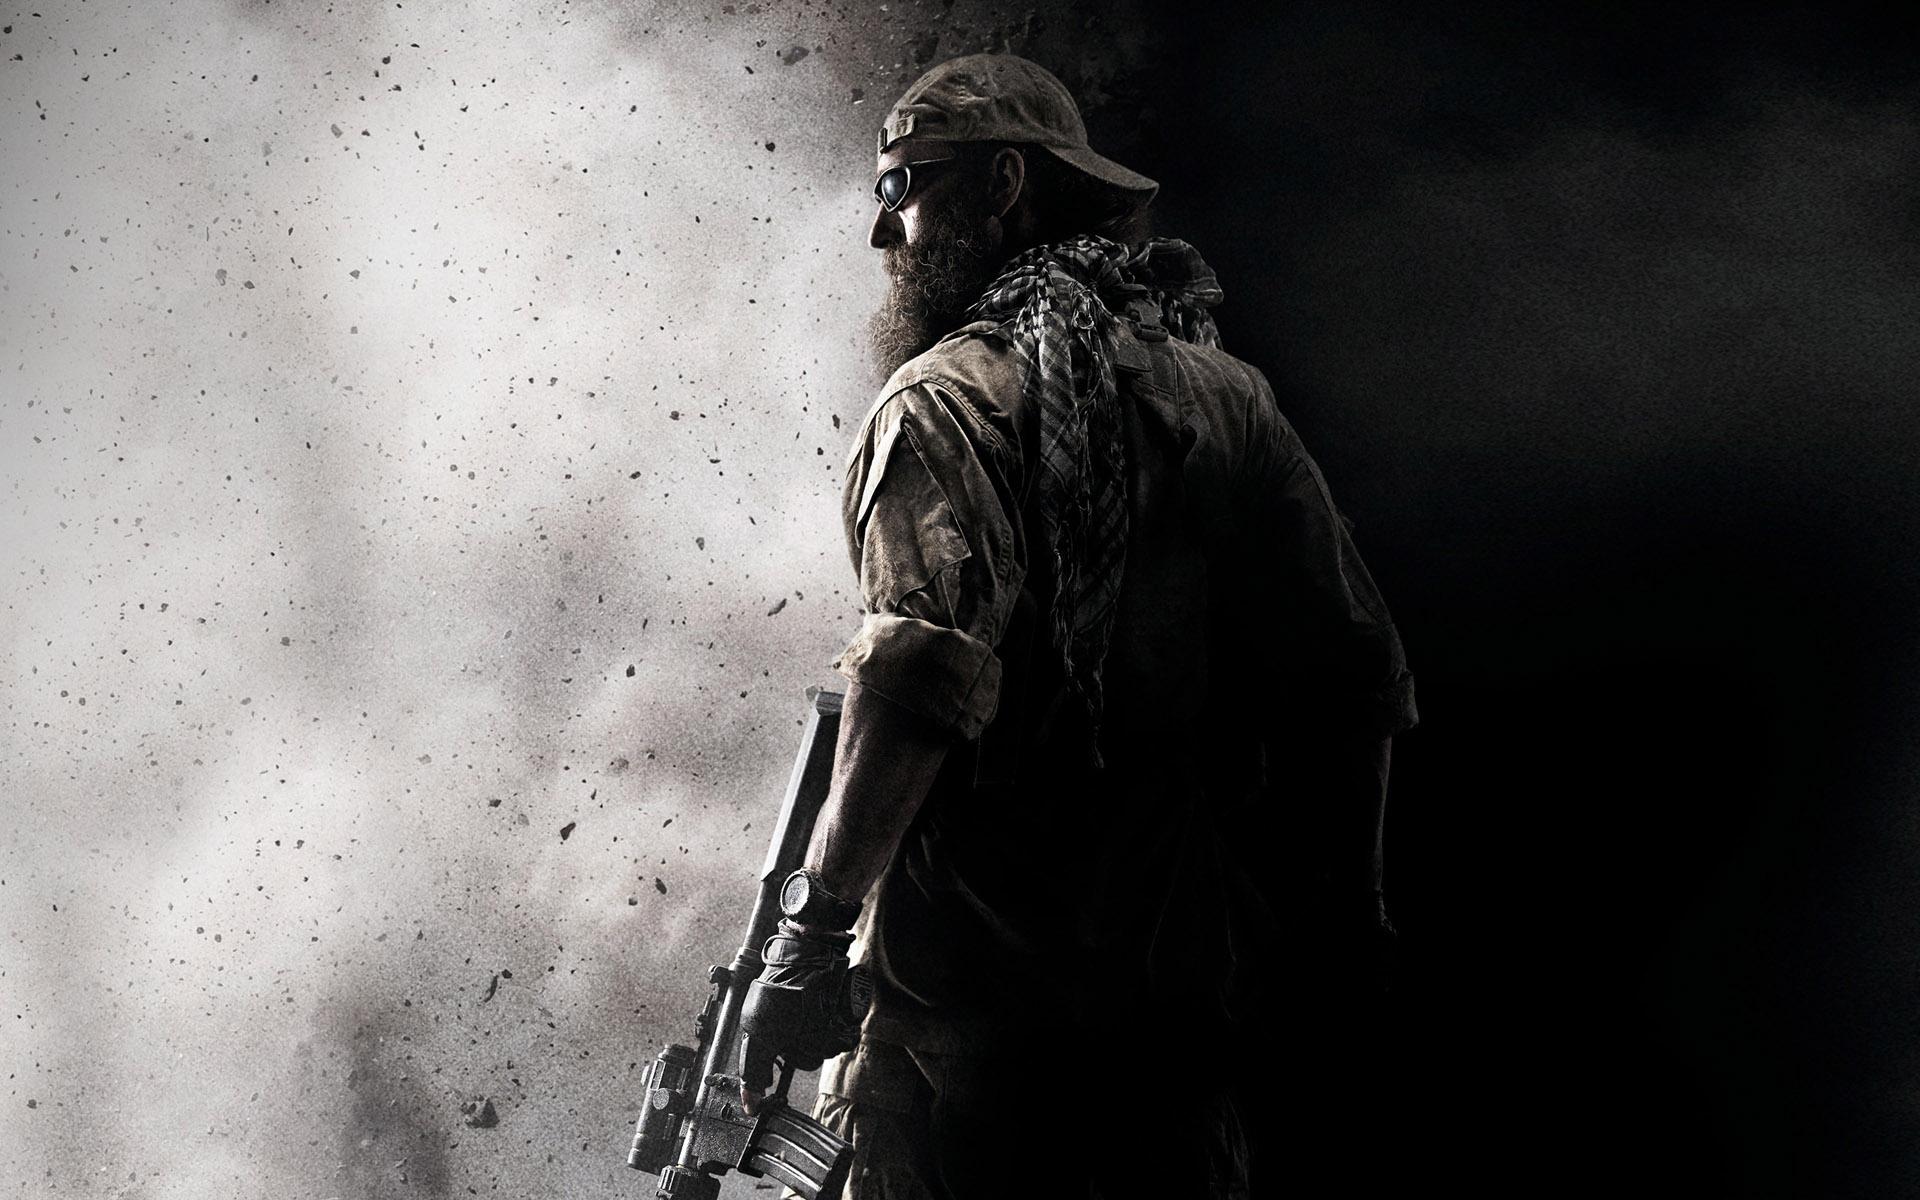 Games_Call_of_Duty_Black_Ops_022239_.jpg - -